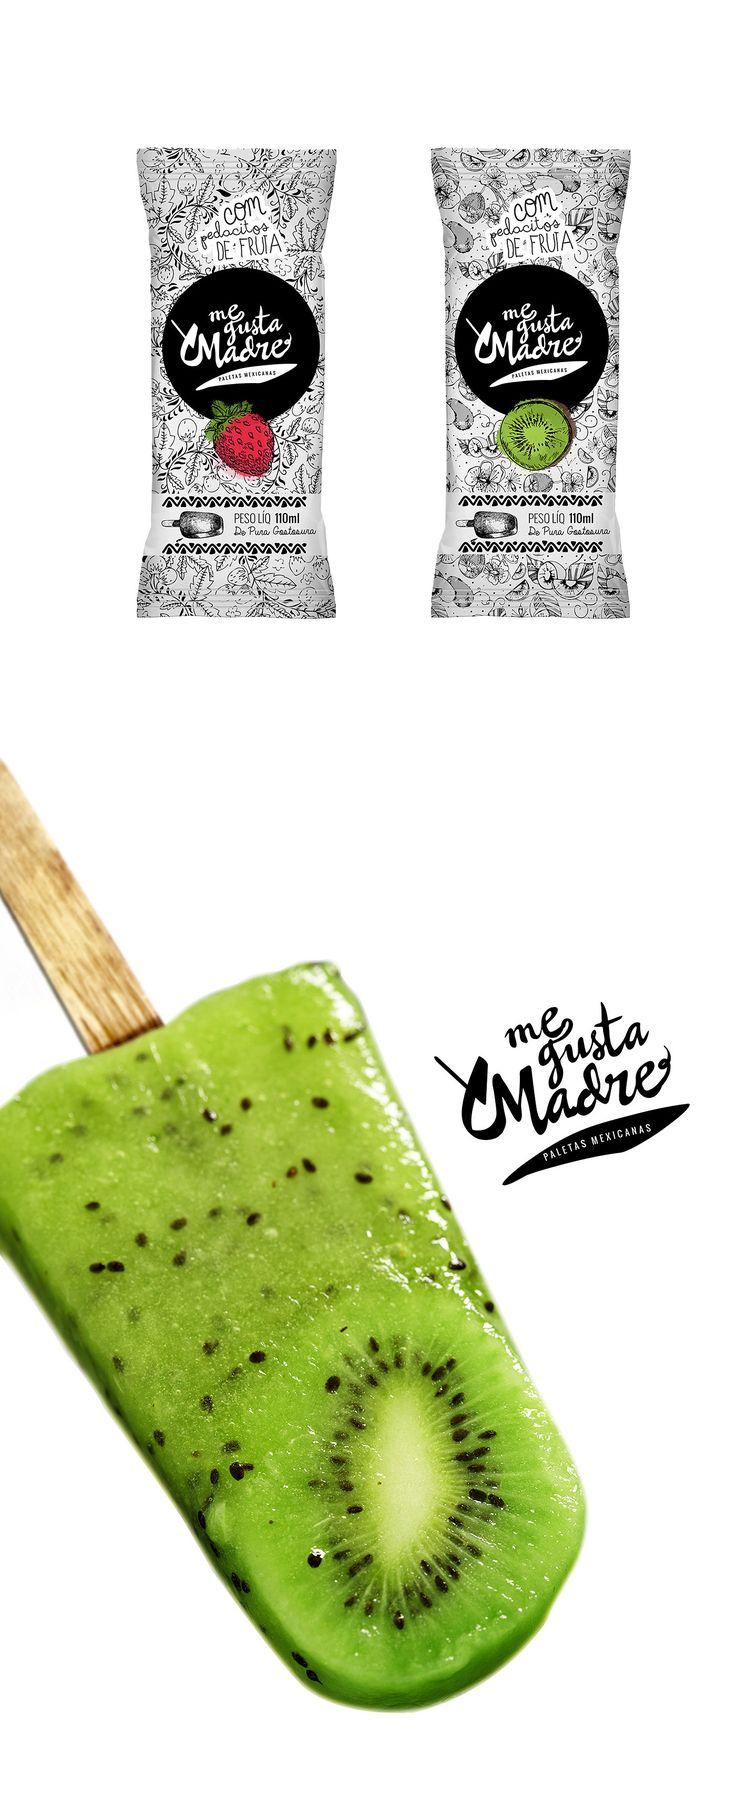 https://www.behance.net/gallery/29956909/ME-GUSTA-MADRE-PALETAS-MEXICANAS-ICE-CREAM